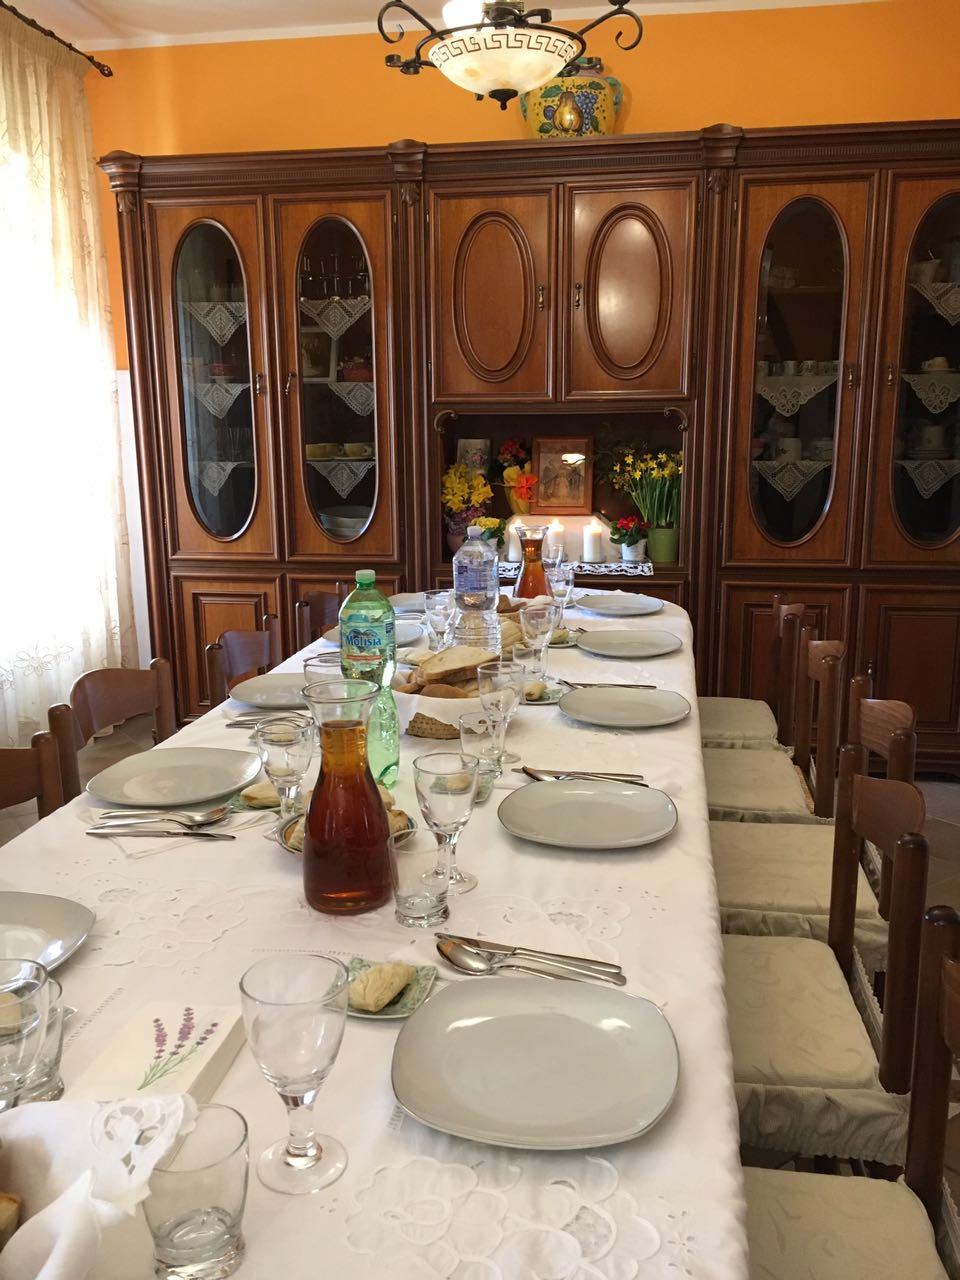 La sacra famiglia a tavola